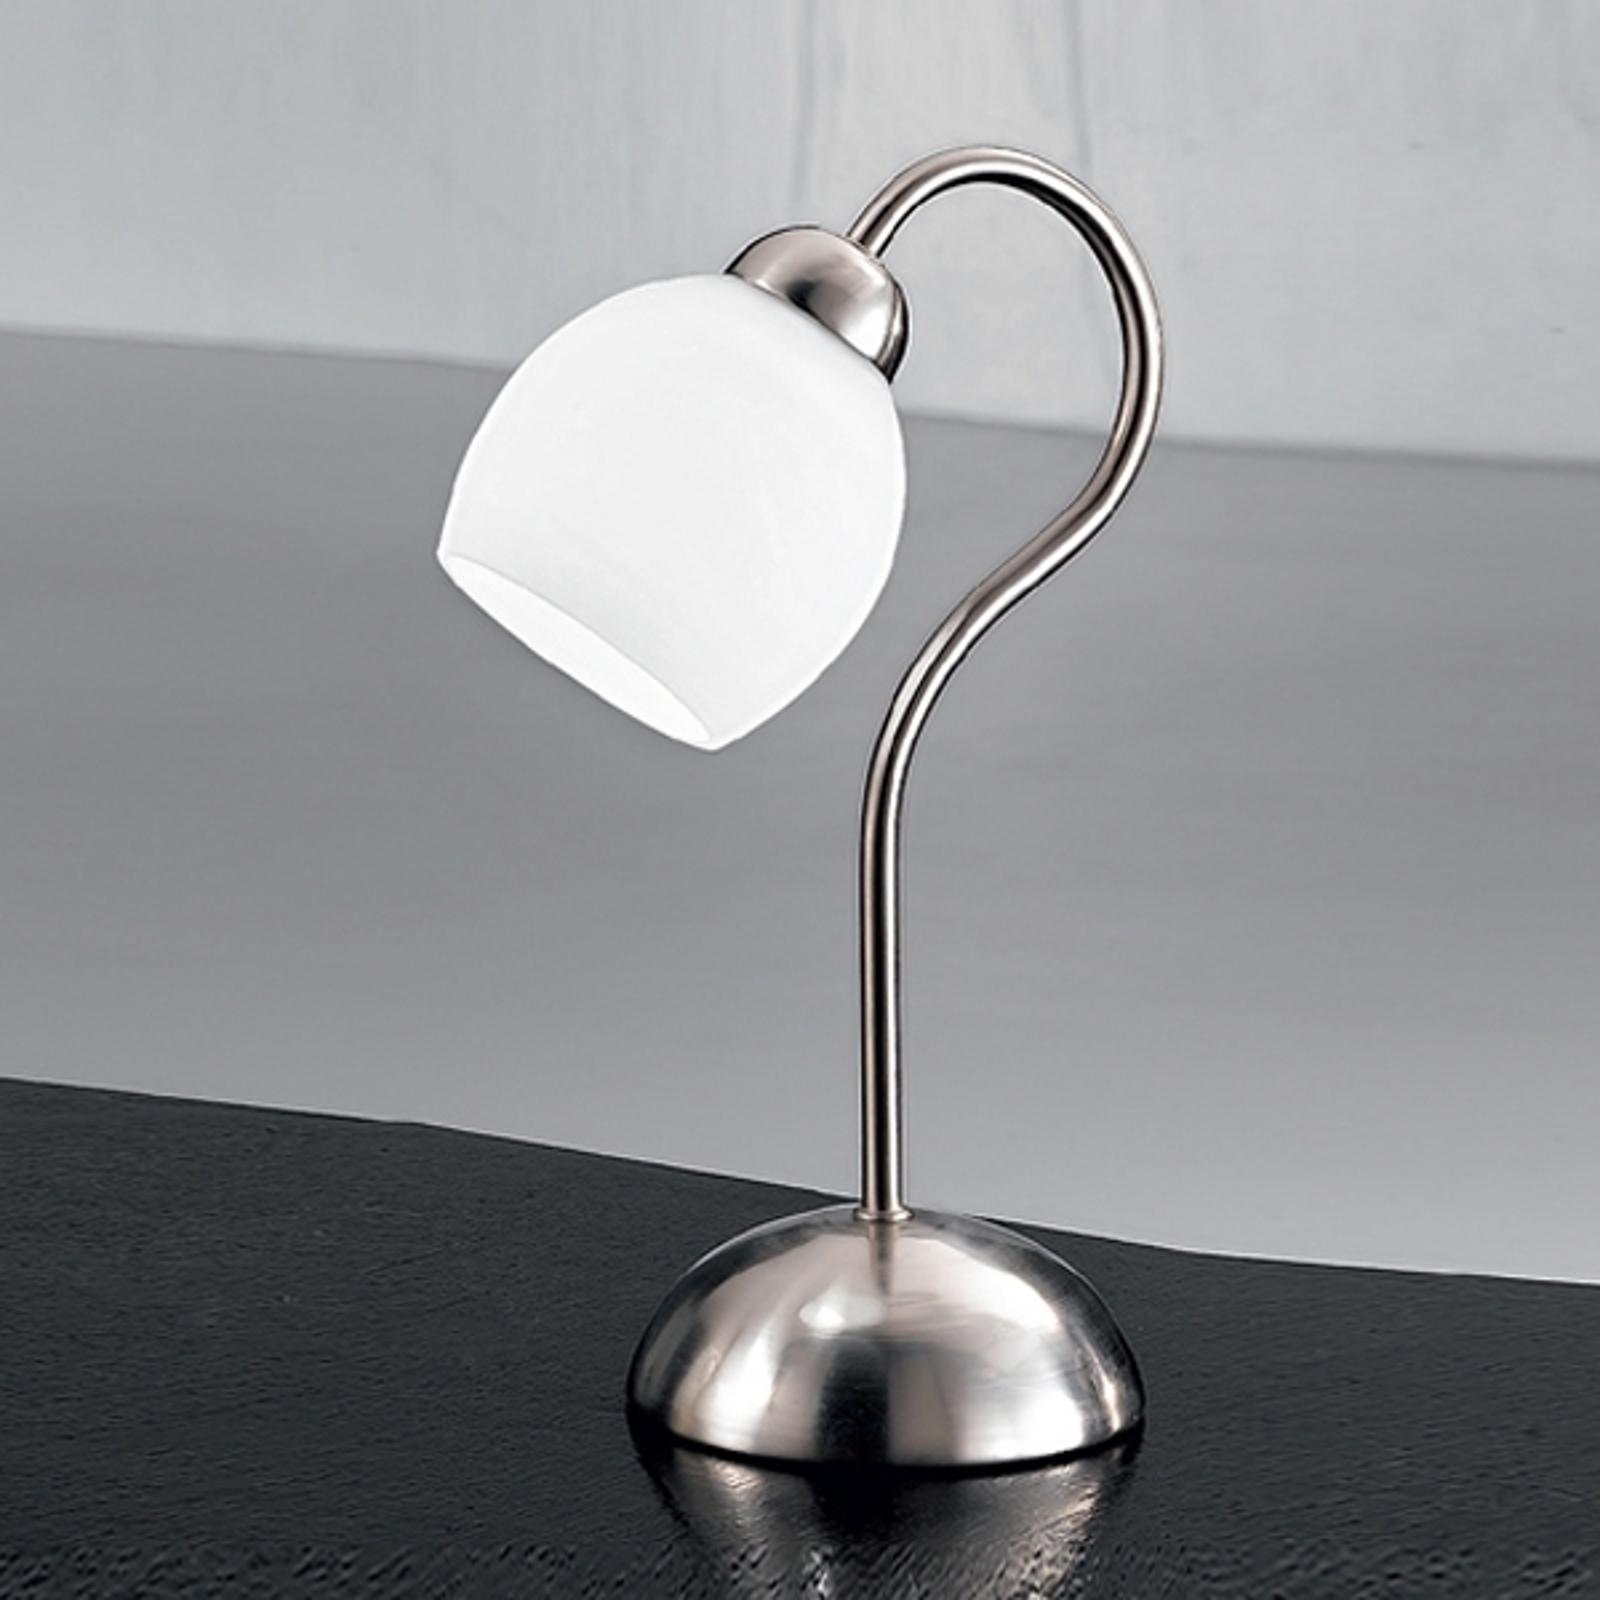 Leuke tafellamp Doma, gesatineerd